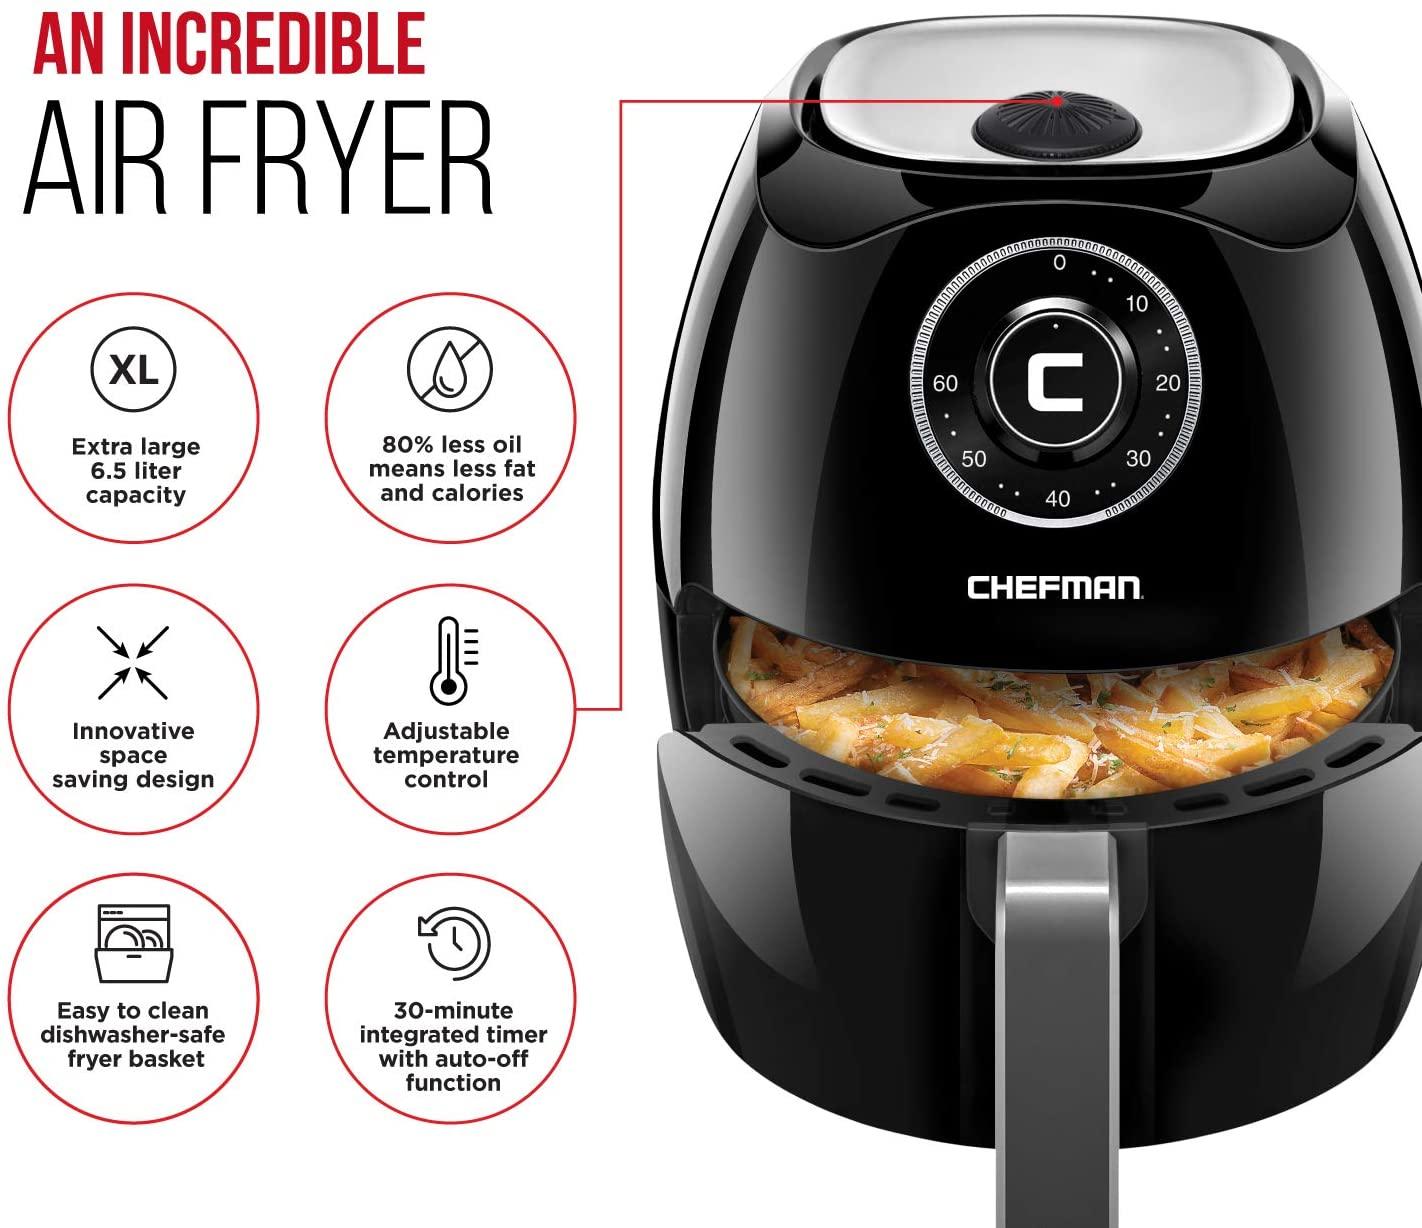 Chefman Quart Air Fryer Oven